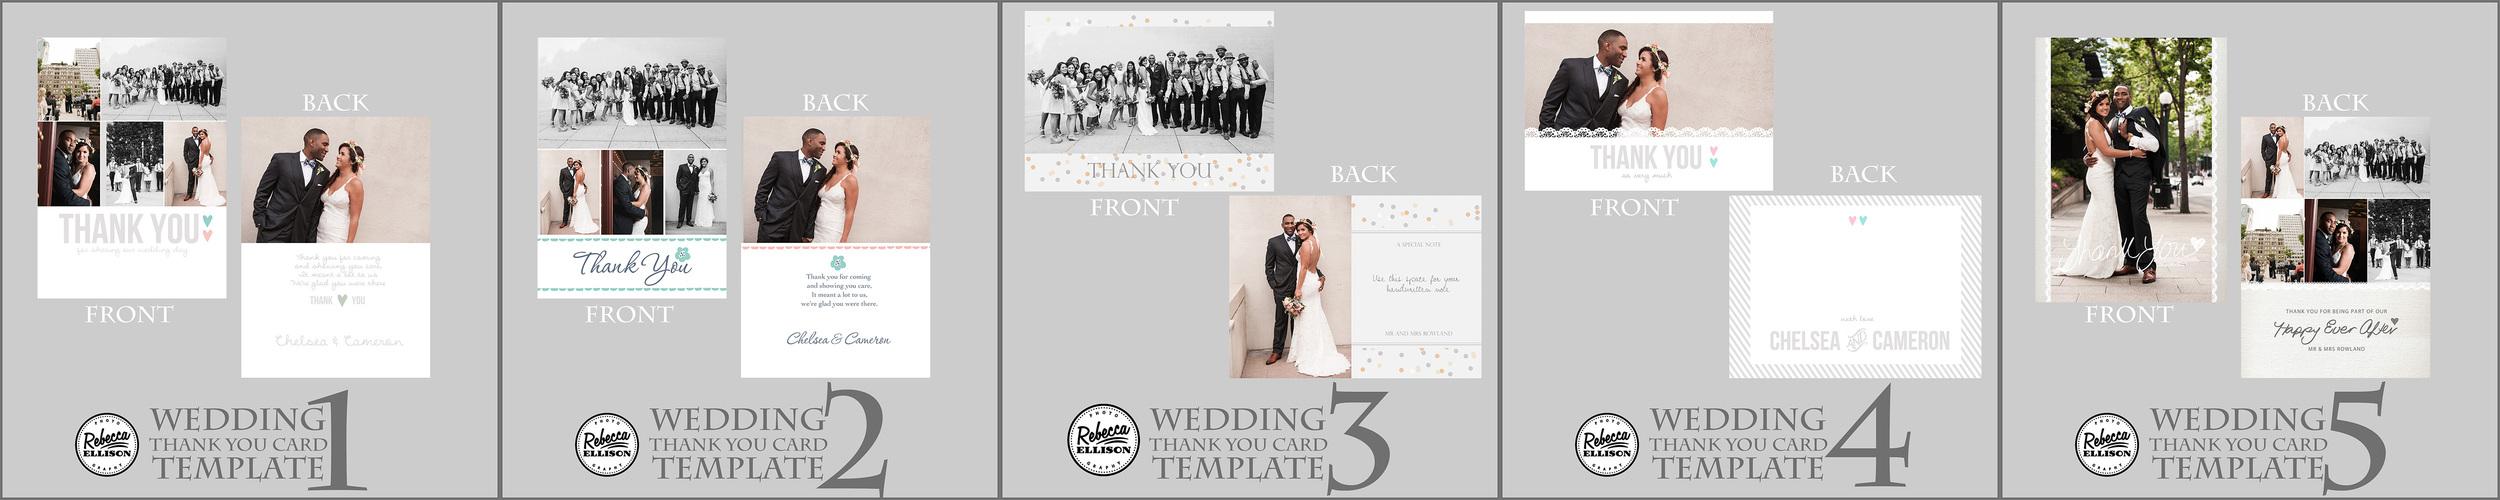 thank-you-card-templates